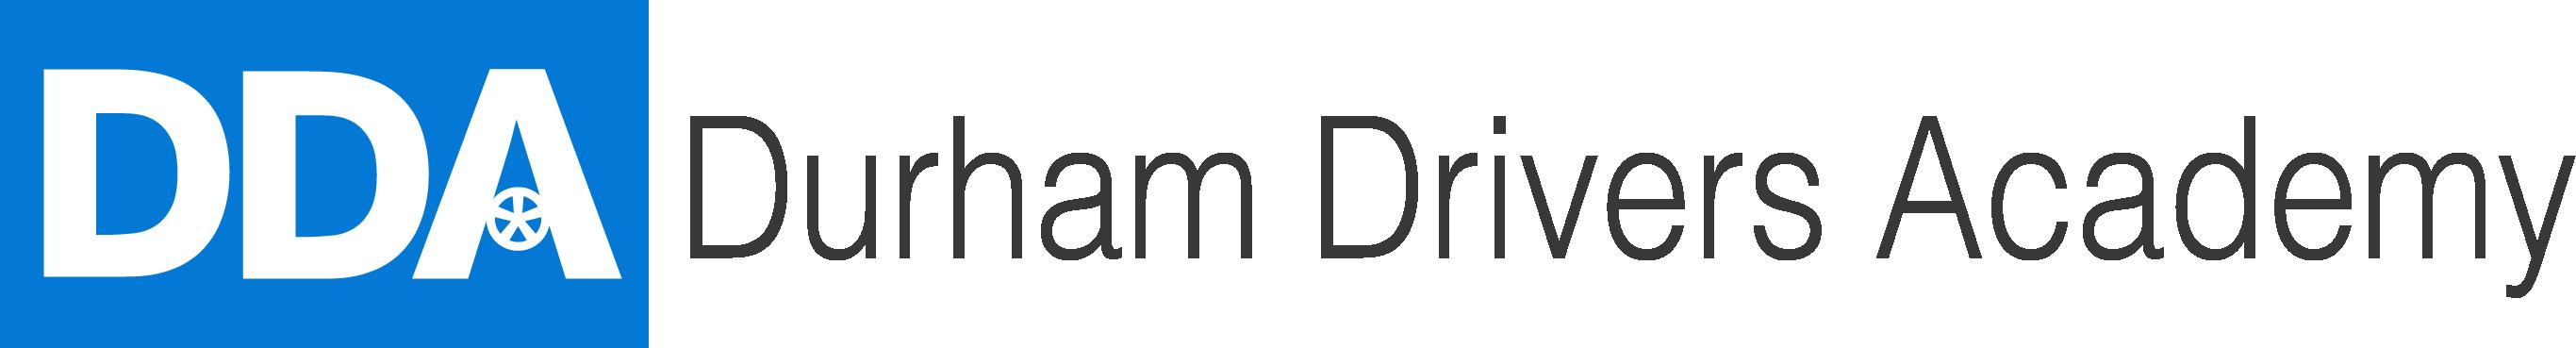 Durham Drivers Academy